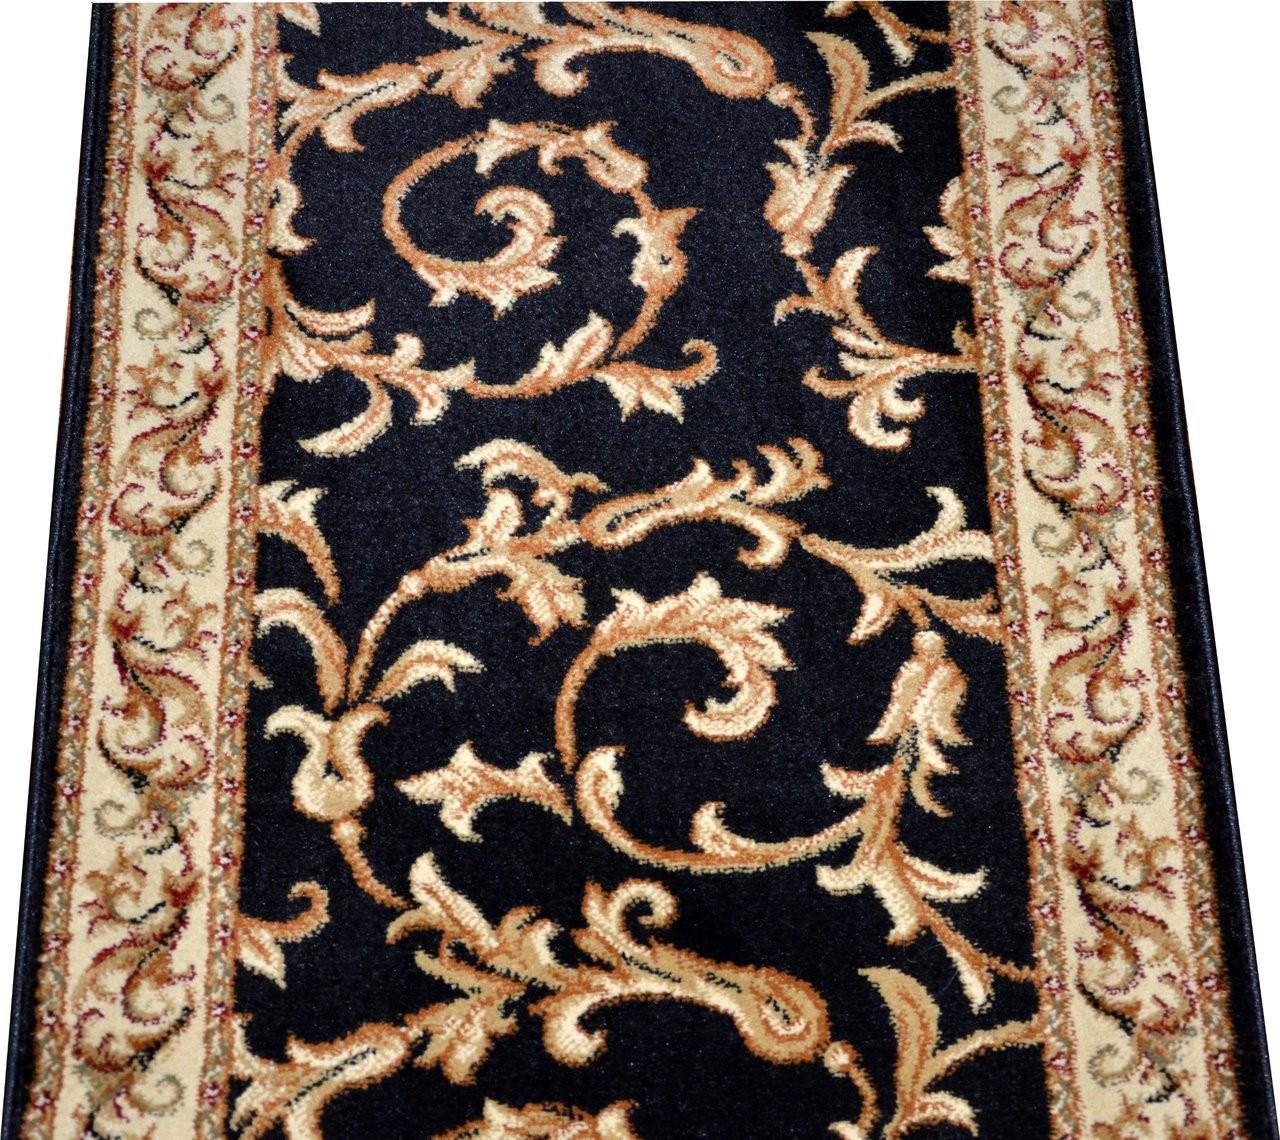 Dean Black Scrollworks Custom Length Carpet Rug Hallway   Carpet Stair Runners By The Foot